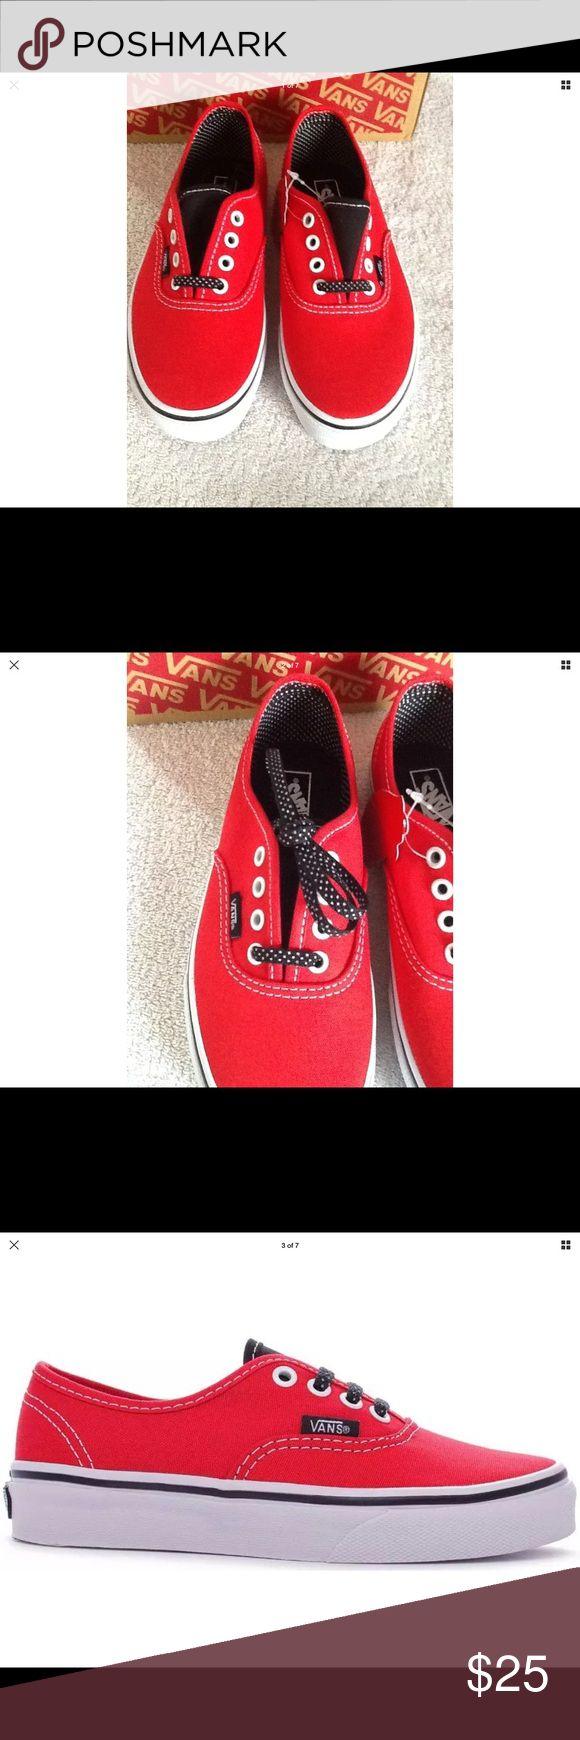 Girls Vans Authentic Polka Dot shoes Vans Authentic Polka Dot Shoes Vans Shoes Sneakers